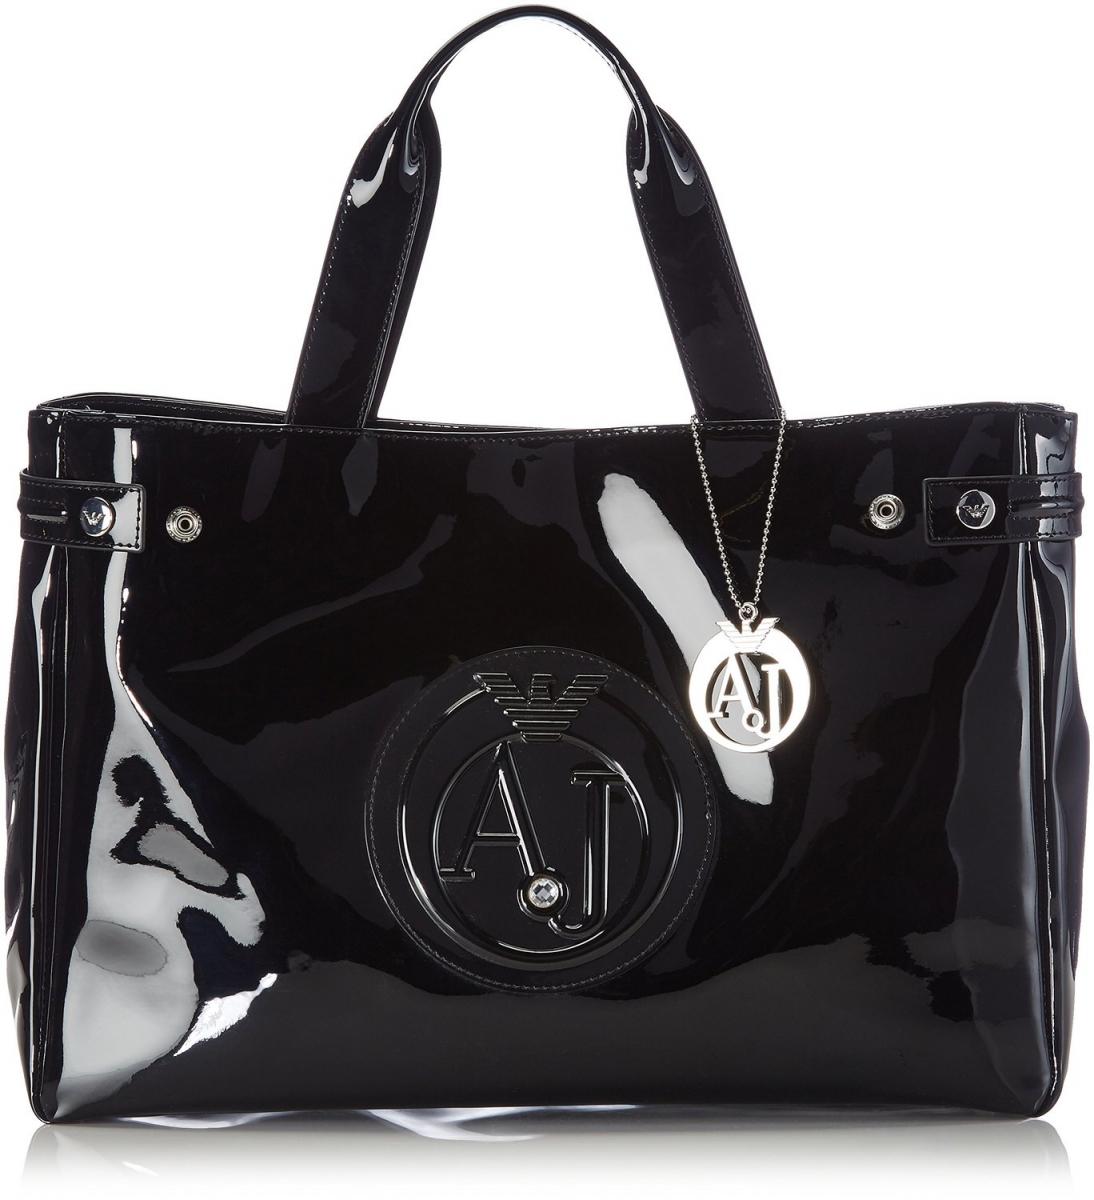 Armani Jeans Shopping Bag With Charms, černá